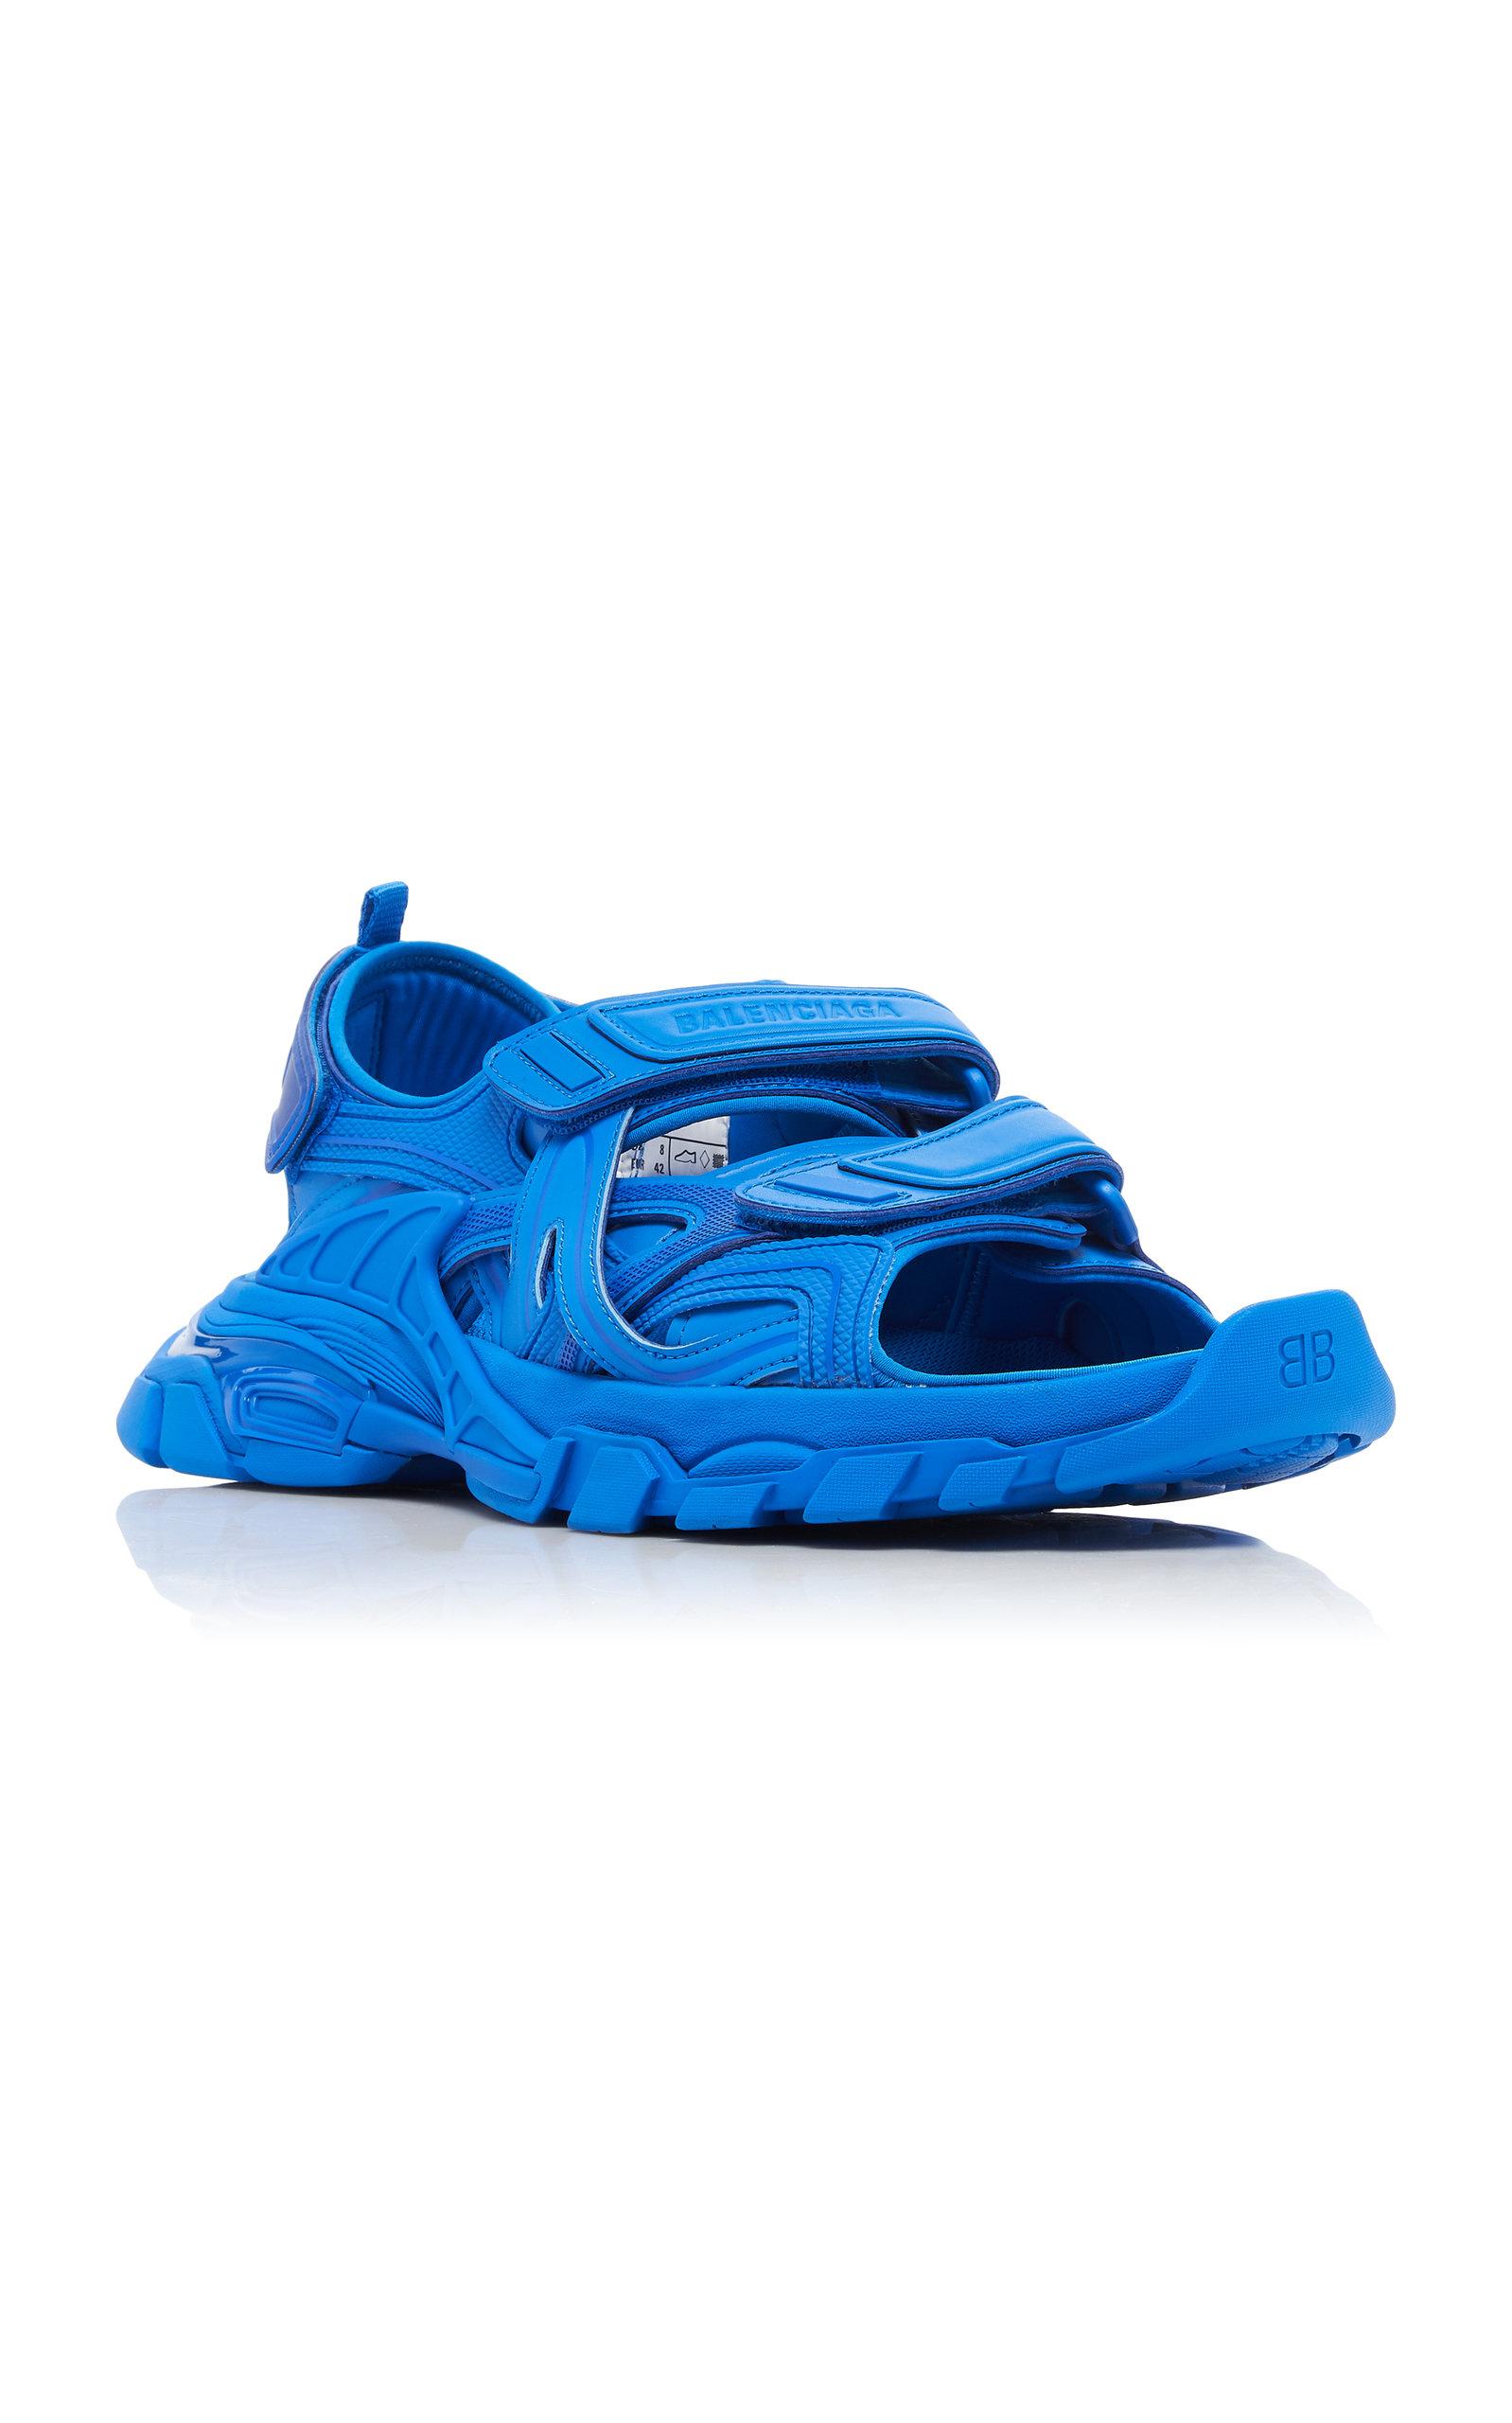 Track Sandal By Balenciaga   Moda Operandi